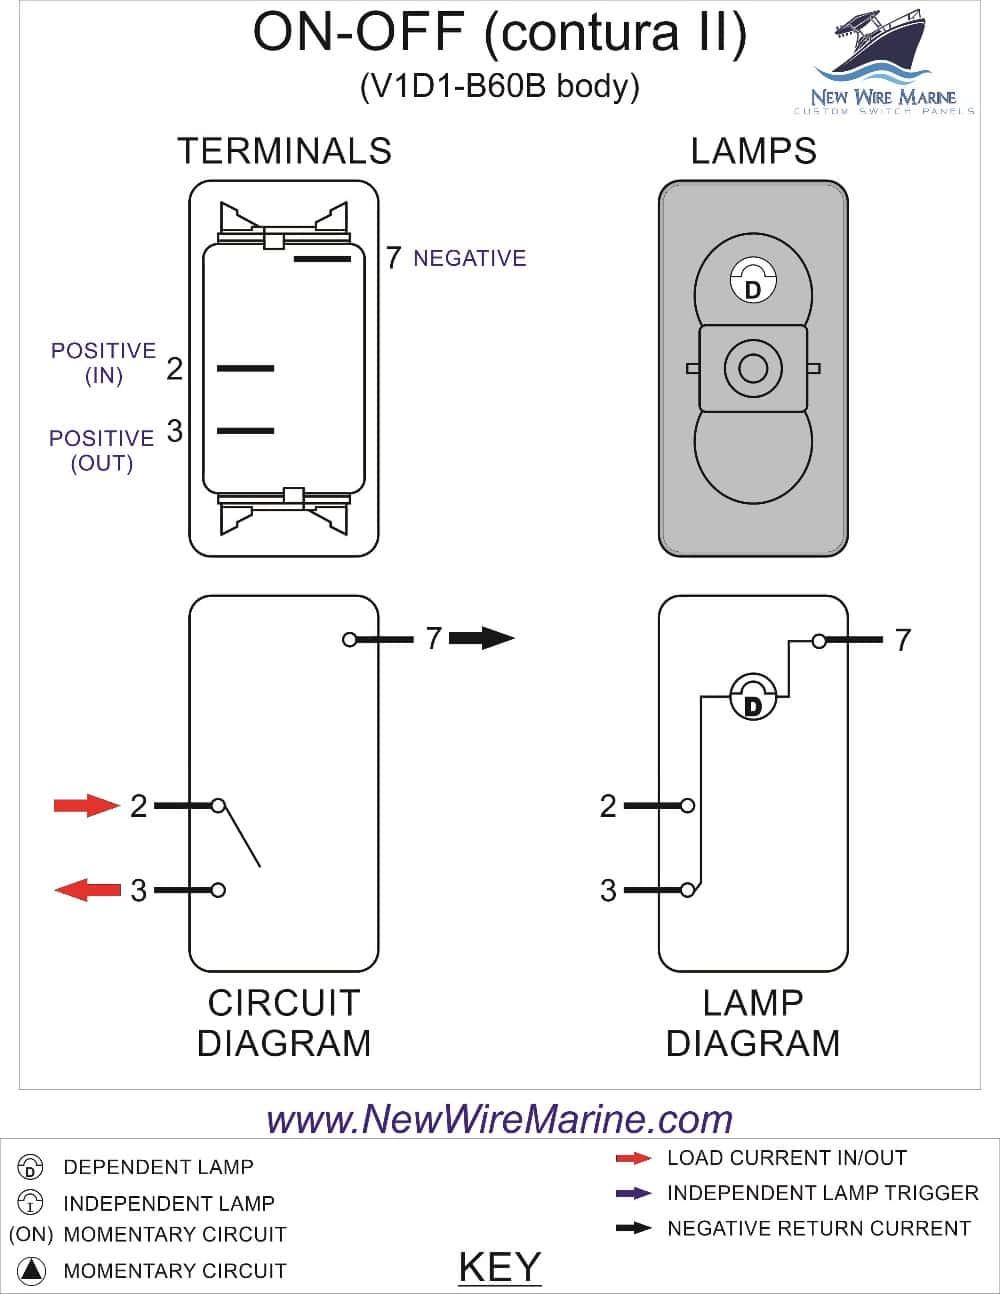 Lt Illuminated Carling Switch Wiring Diagram - Electrical Schematic - Carlingswitch Wiring Diagram